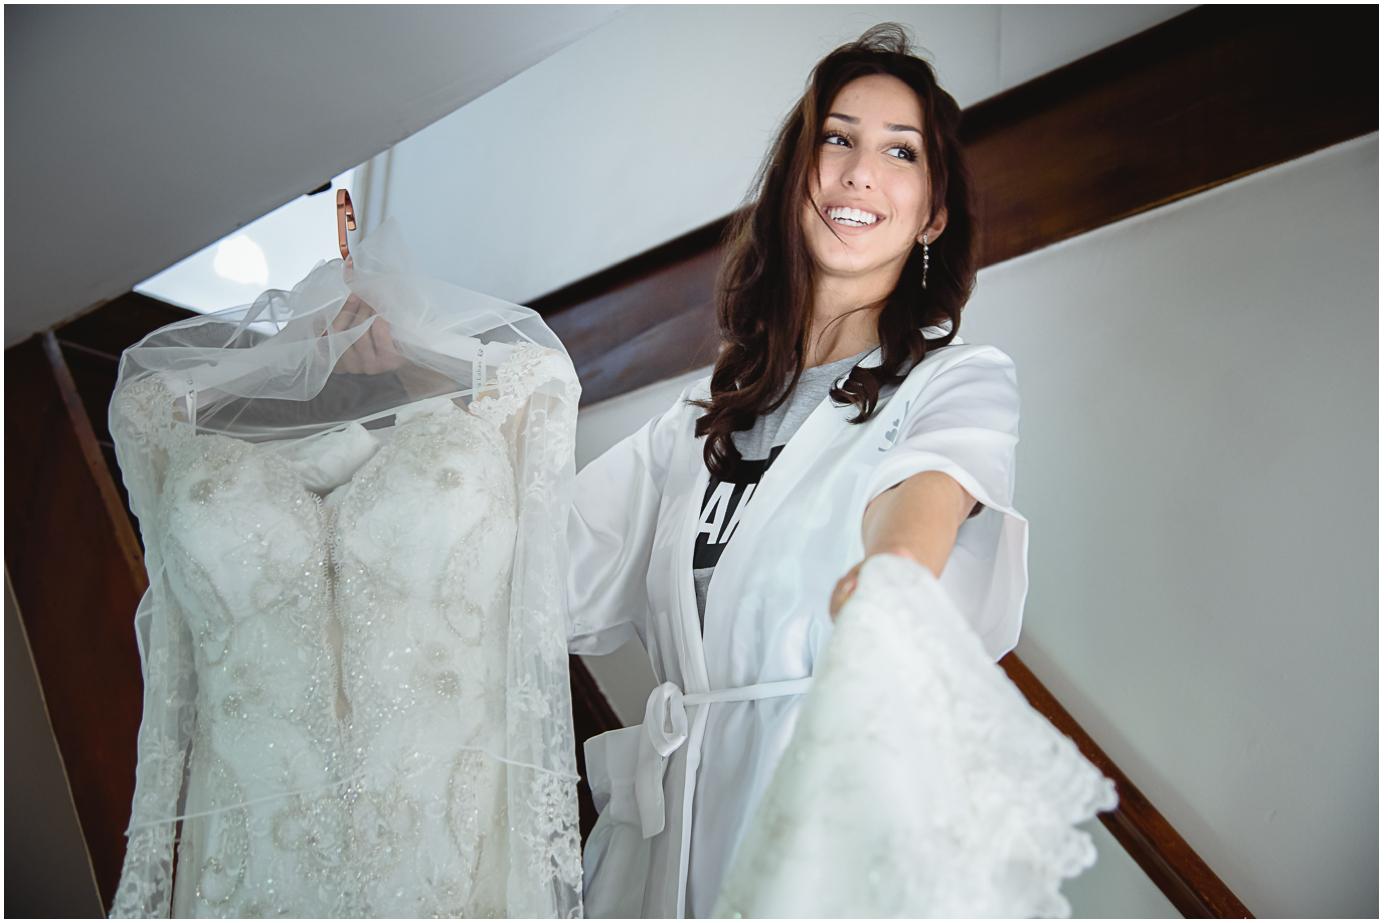 iranian wedding photographer 11 - Drapers Hall London Wedding Photographer